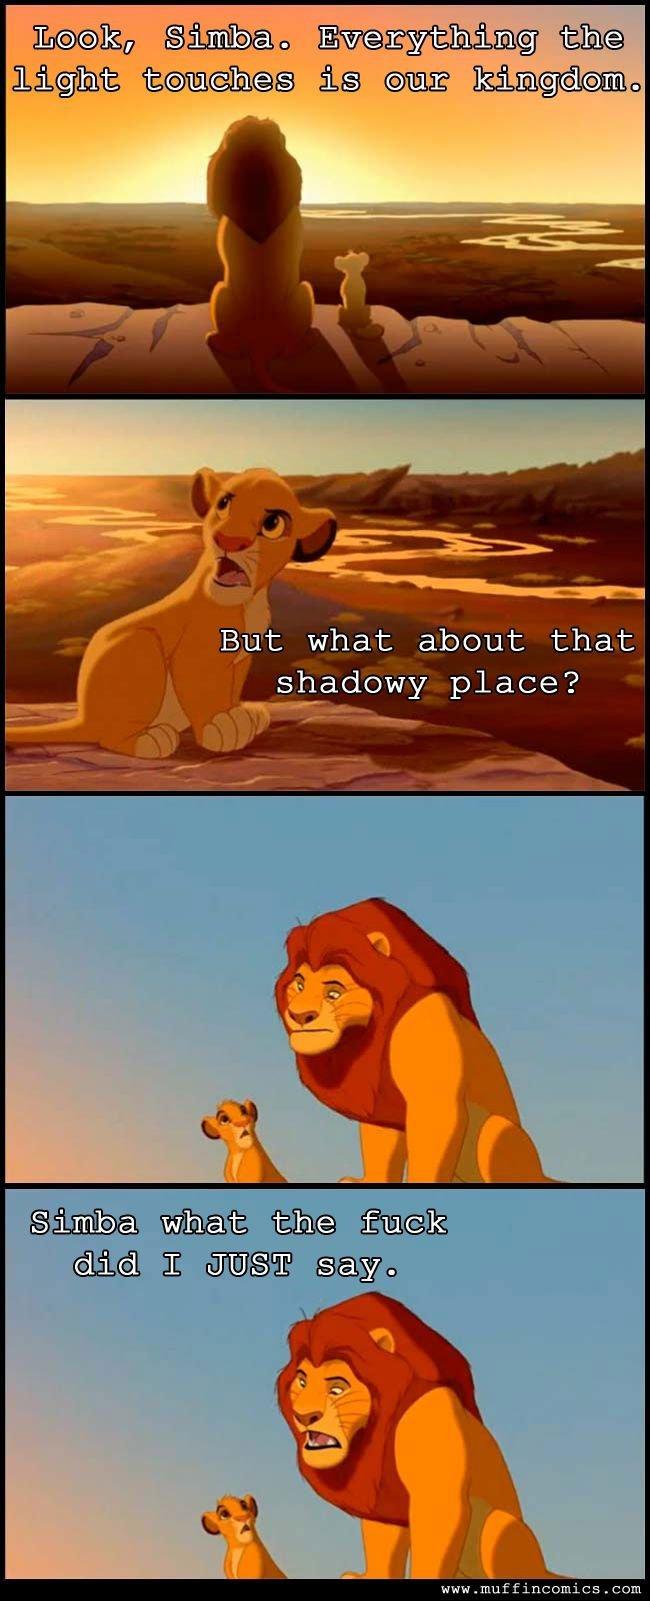 "look, simba. . what about ', shadowy place? iii"" ma 'iig. itoi& dldo, ti: 2, E mating gays look simba what about ' shadowy place? iii"" ma 'iig itoi& dldo ti: 2 E mating gays"